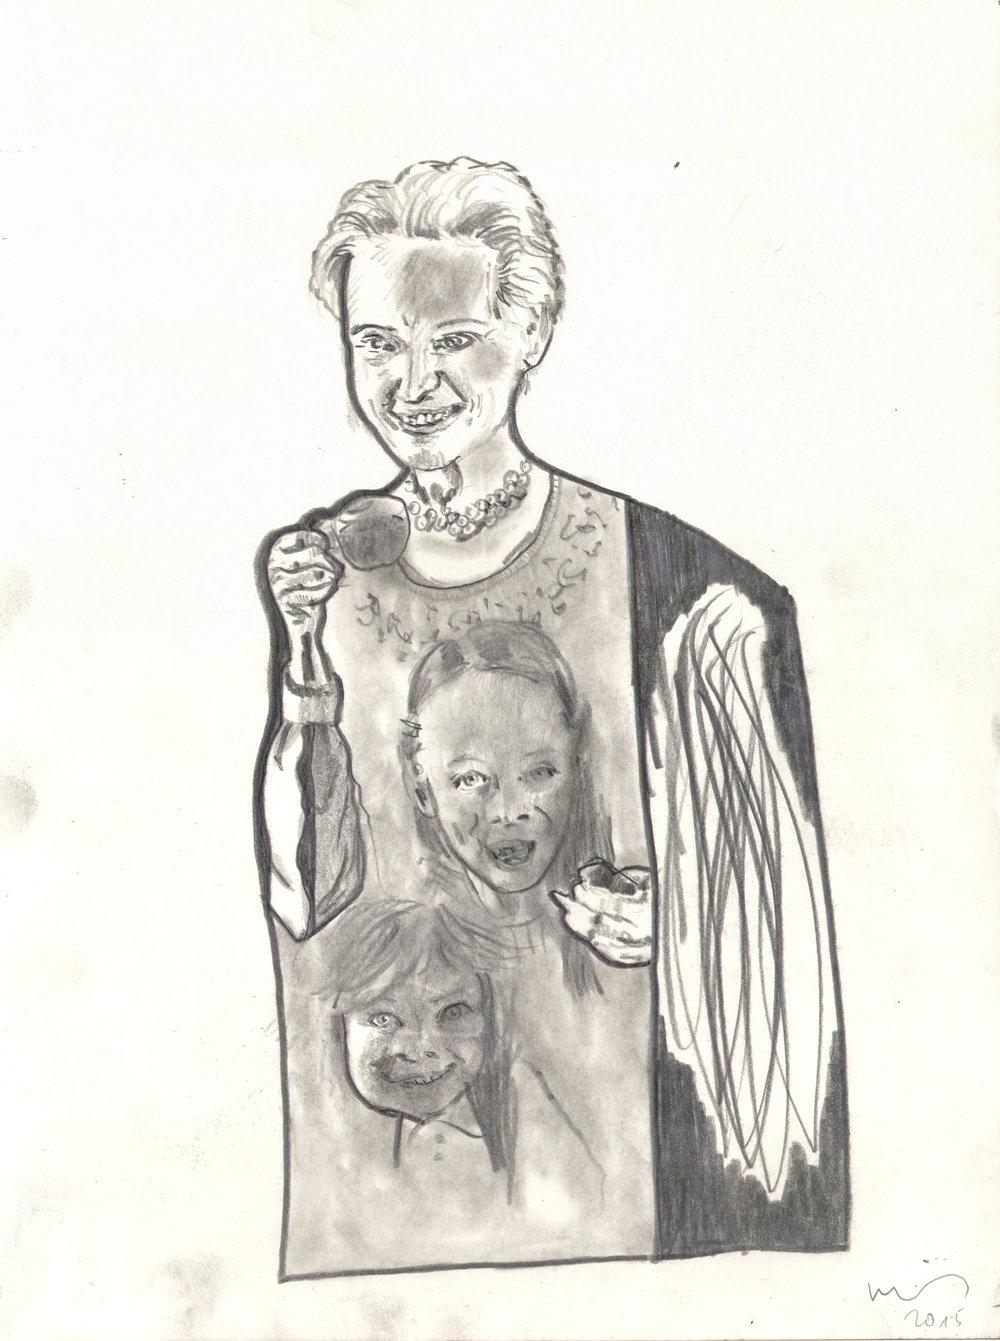 O.T. ( Frau Kinder ), 2015  Bleistift auf Papier, 26x35.5cm